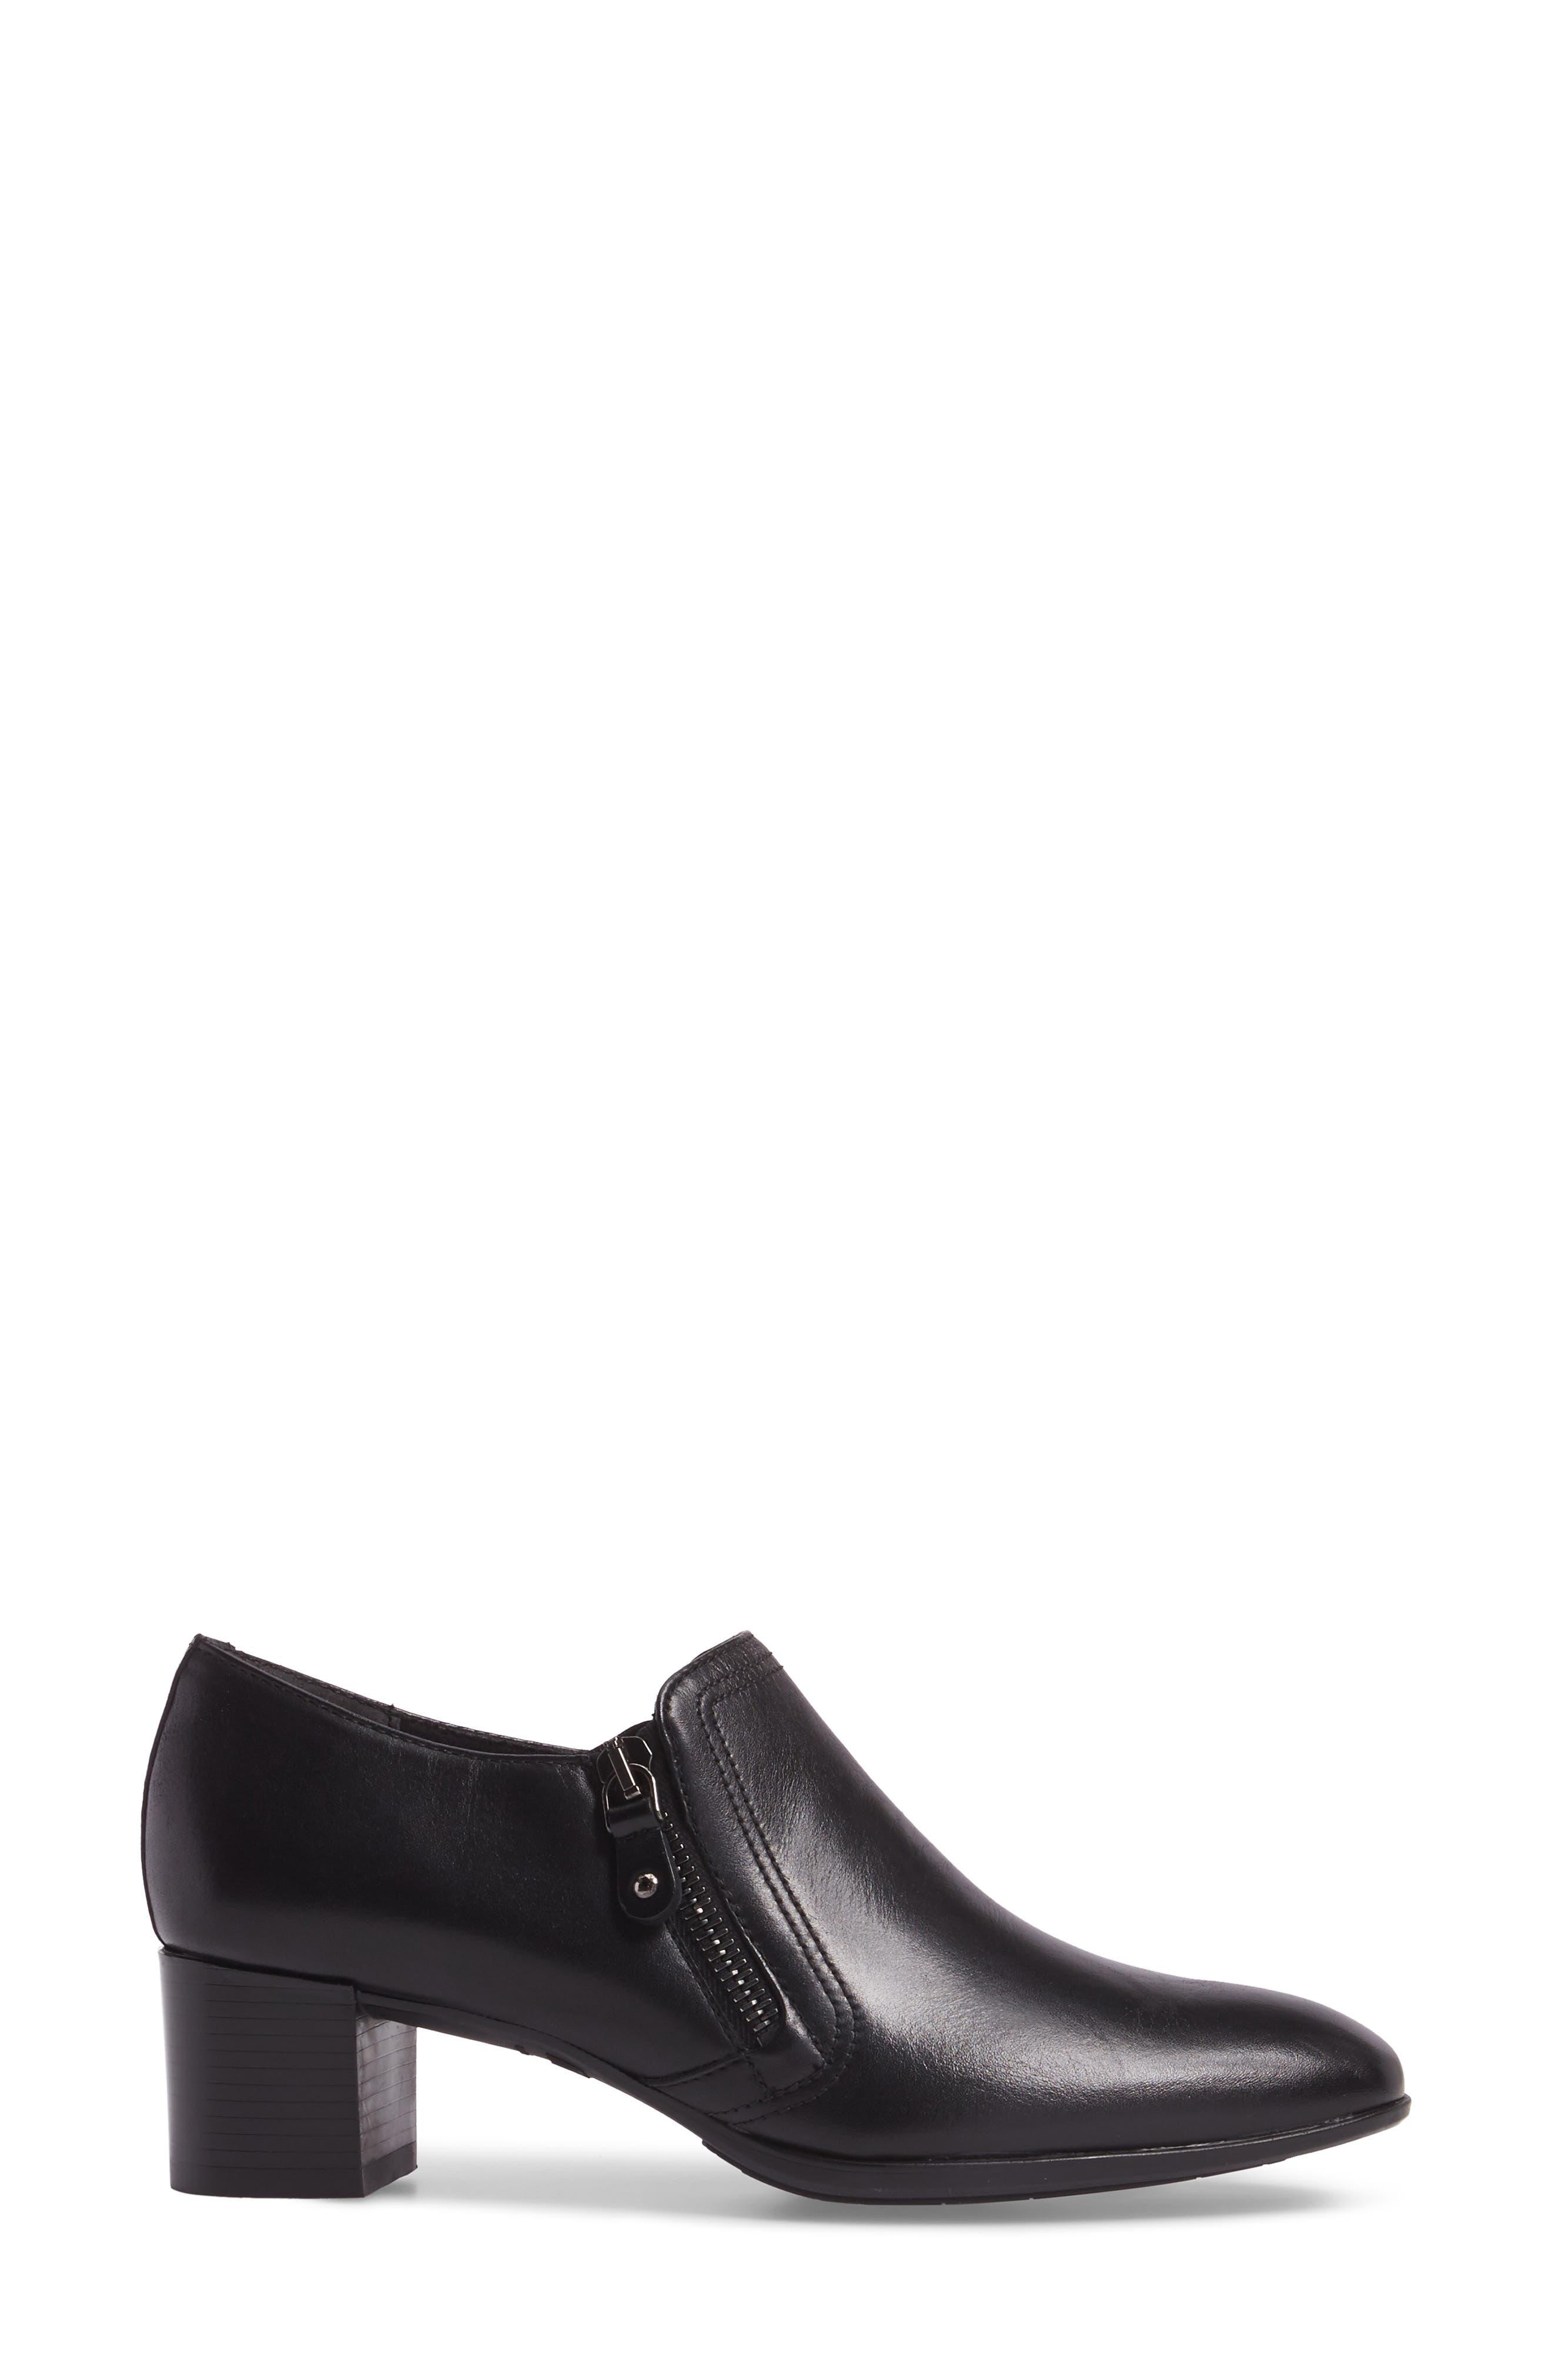 Annee Pump,                             Alternate thumbnail 3, color,                             Black Leather